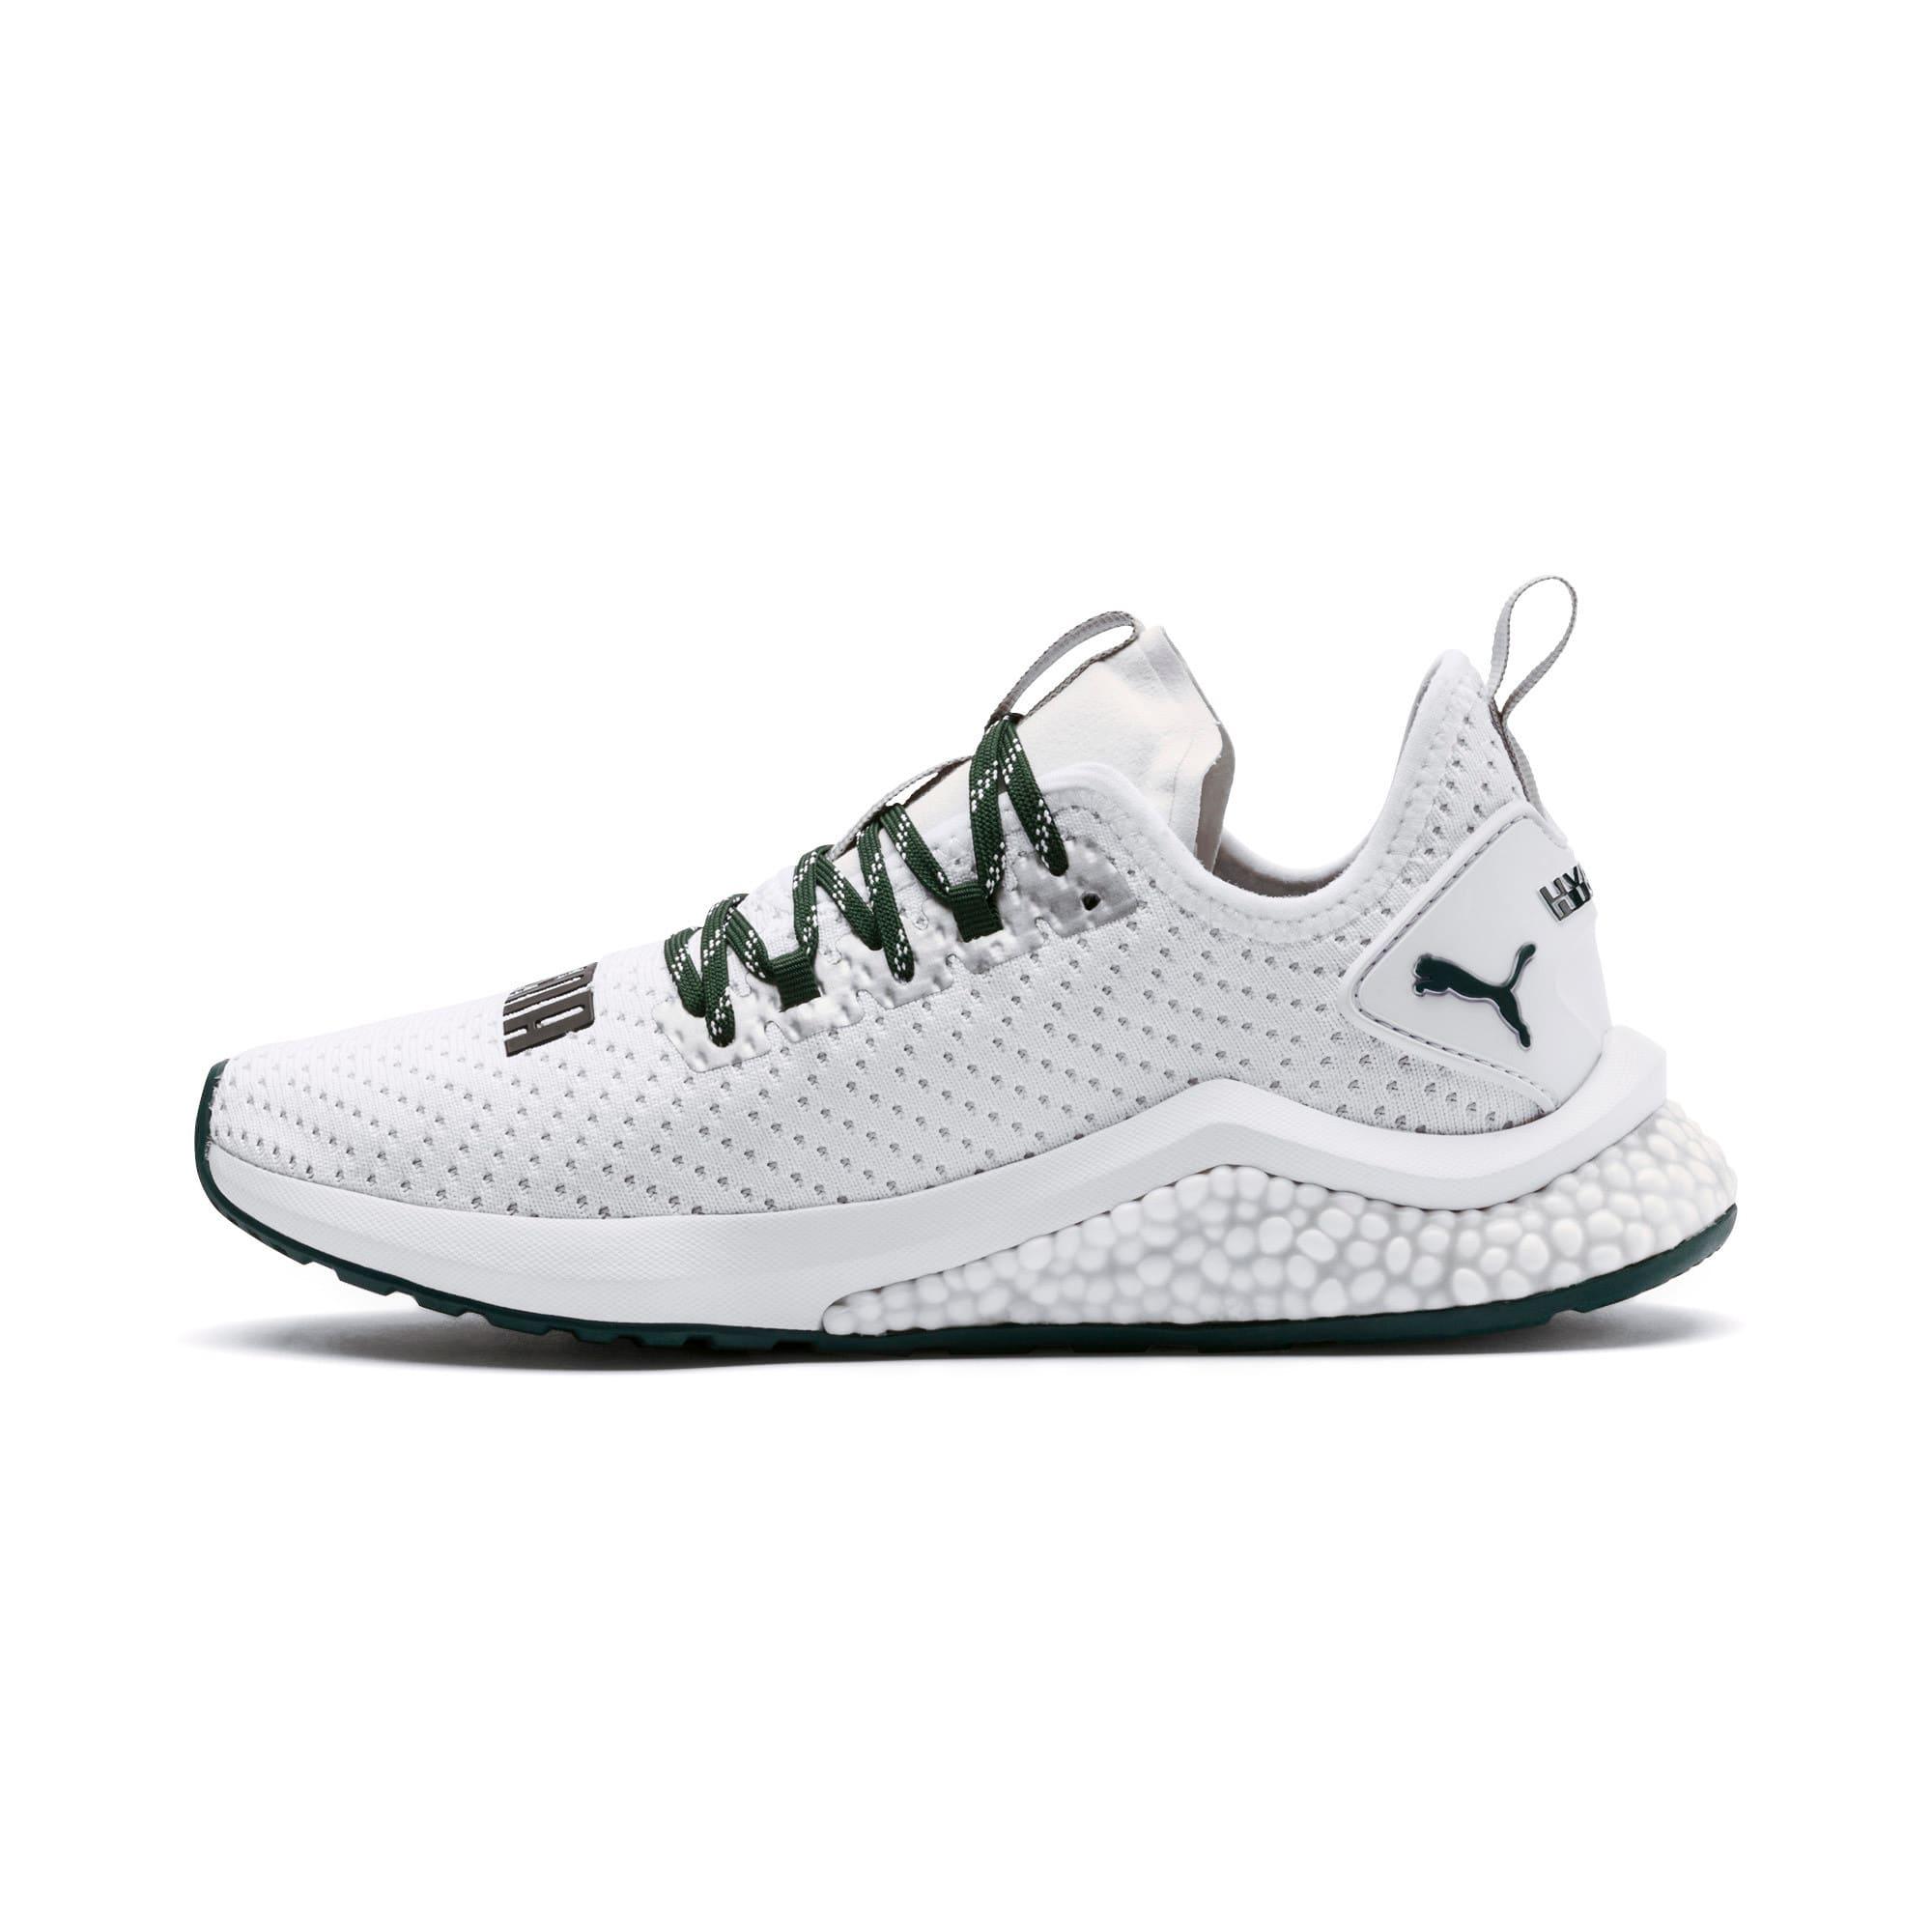 Thumbnail 1 of HYBRID NX Trailblazer Women's Running Shoes, Puma White-Ponderosa Pine, medium